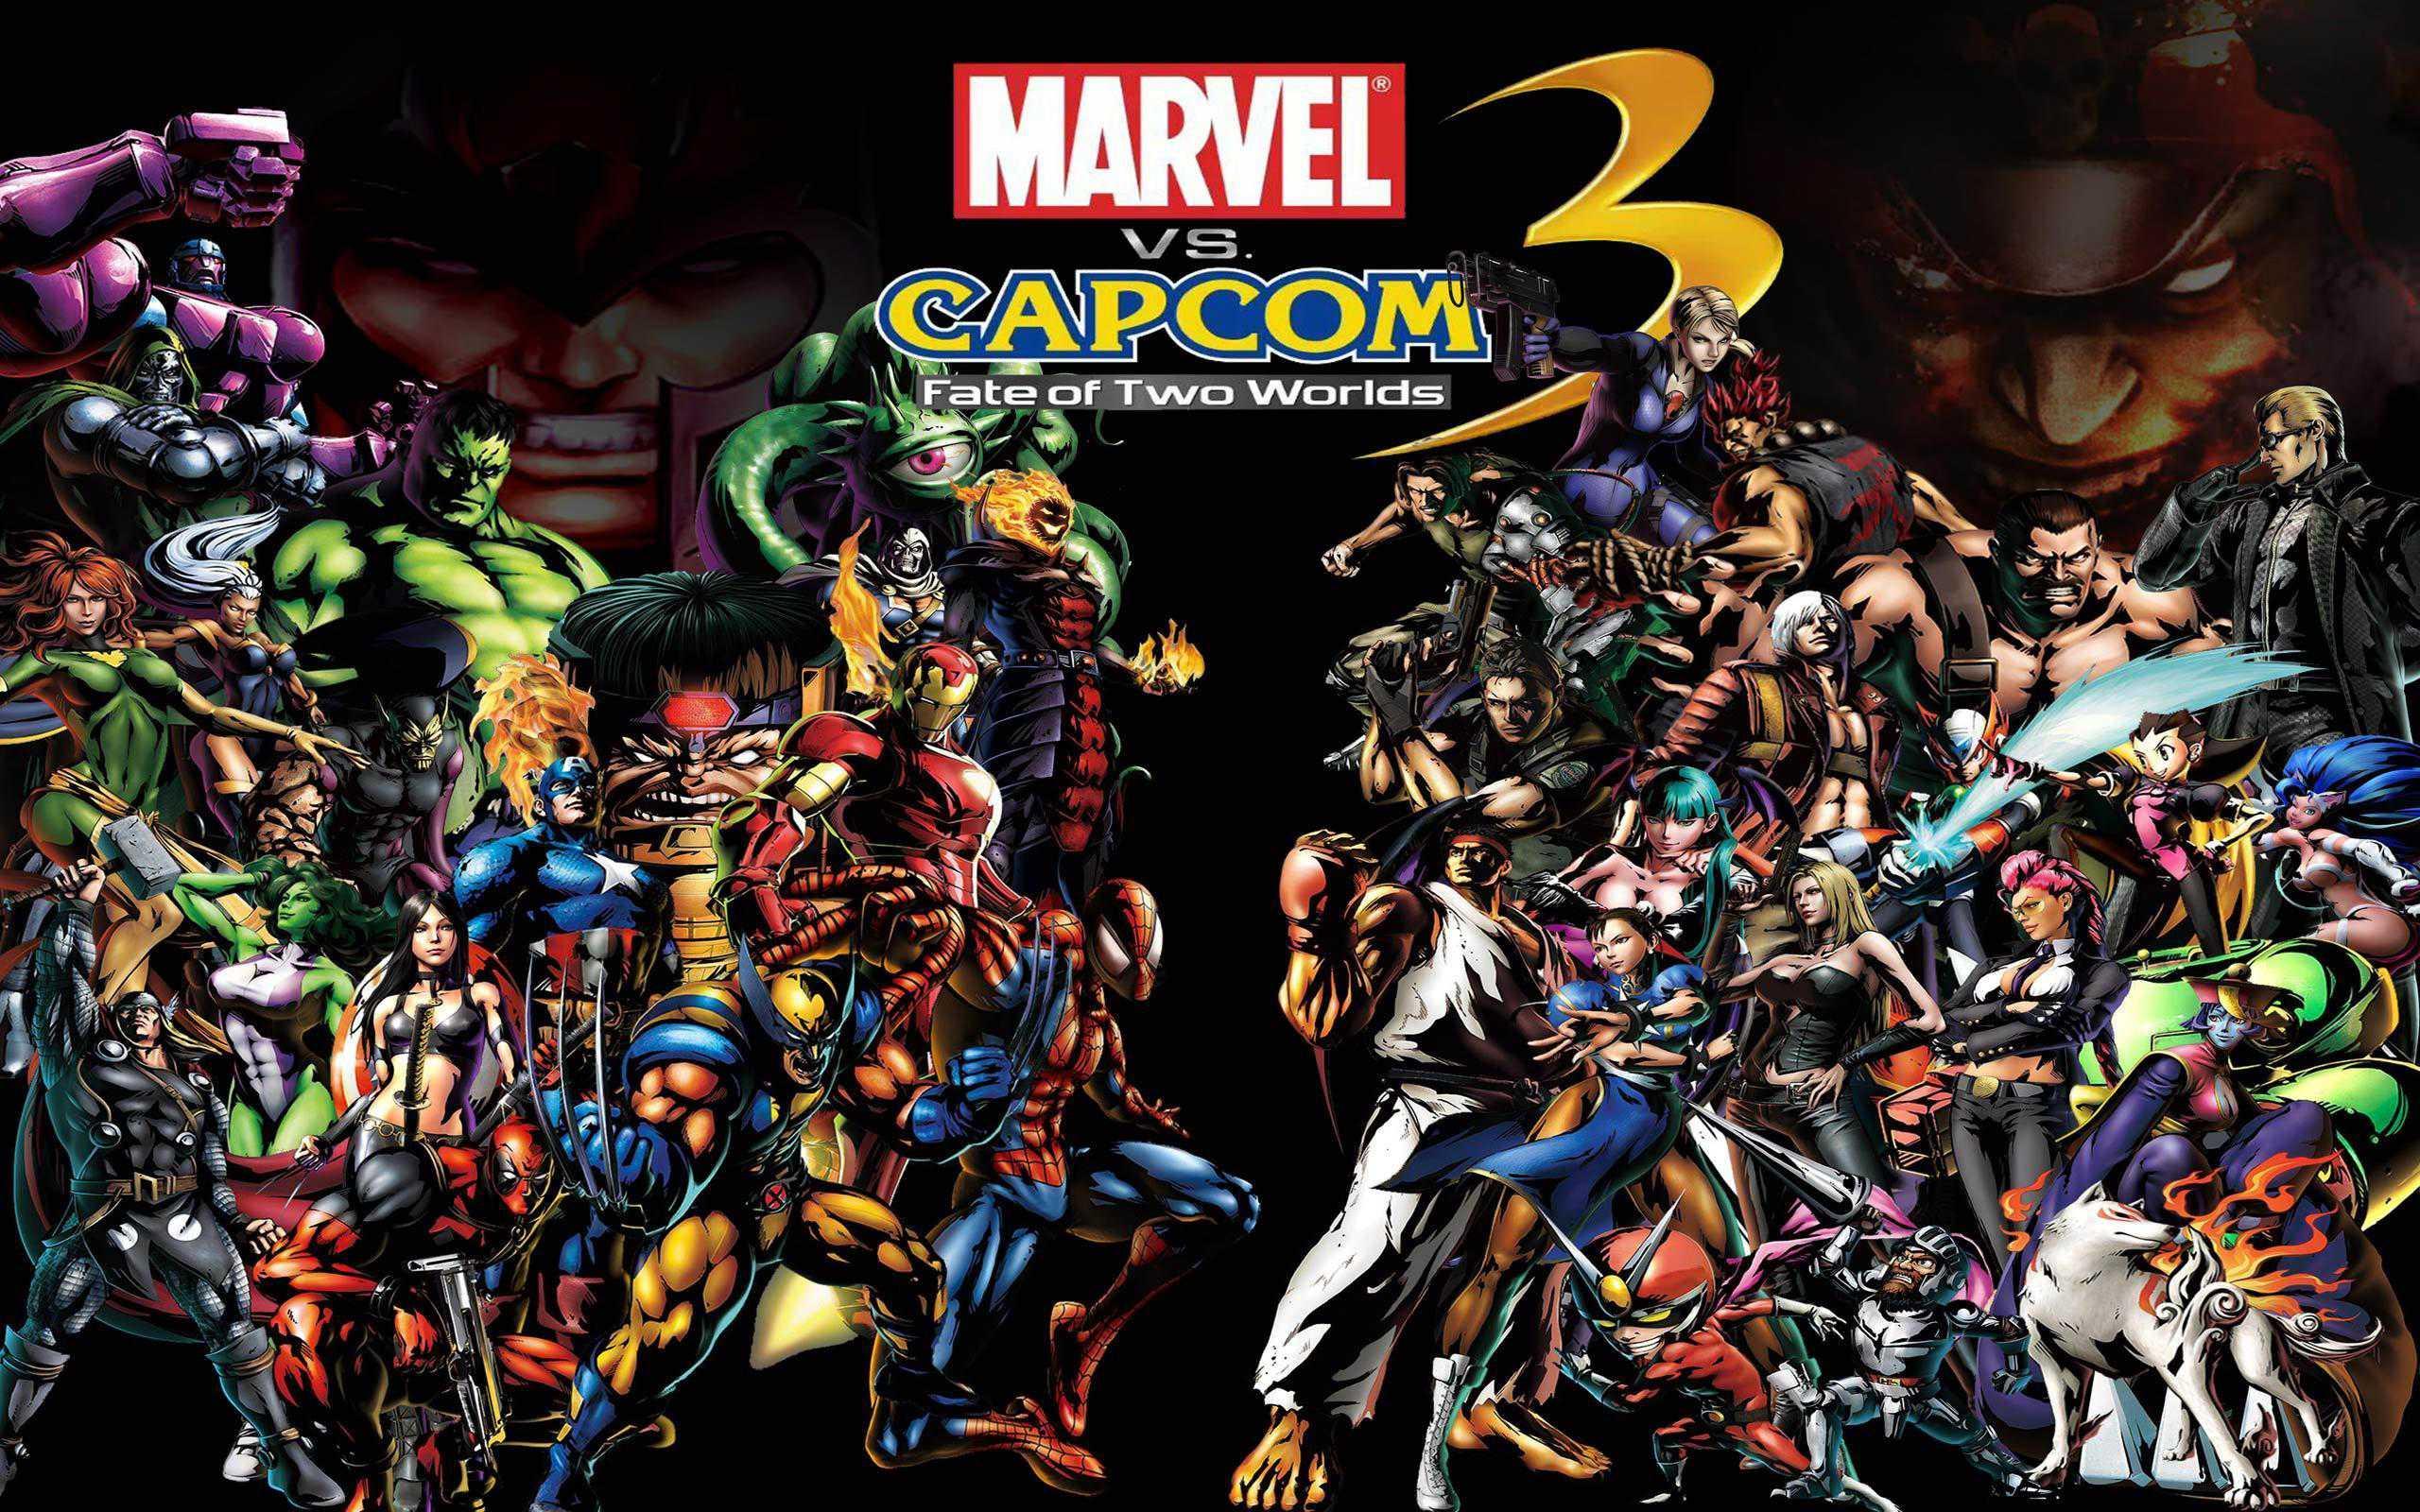 Best Fighting Games - Ultimate Marvel VS Capcom 3